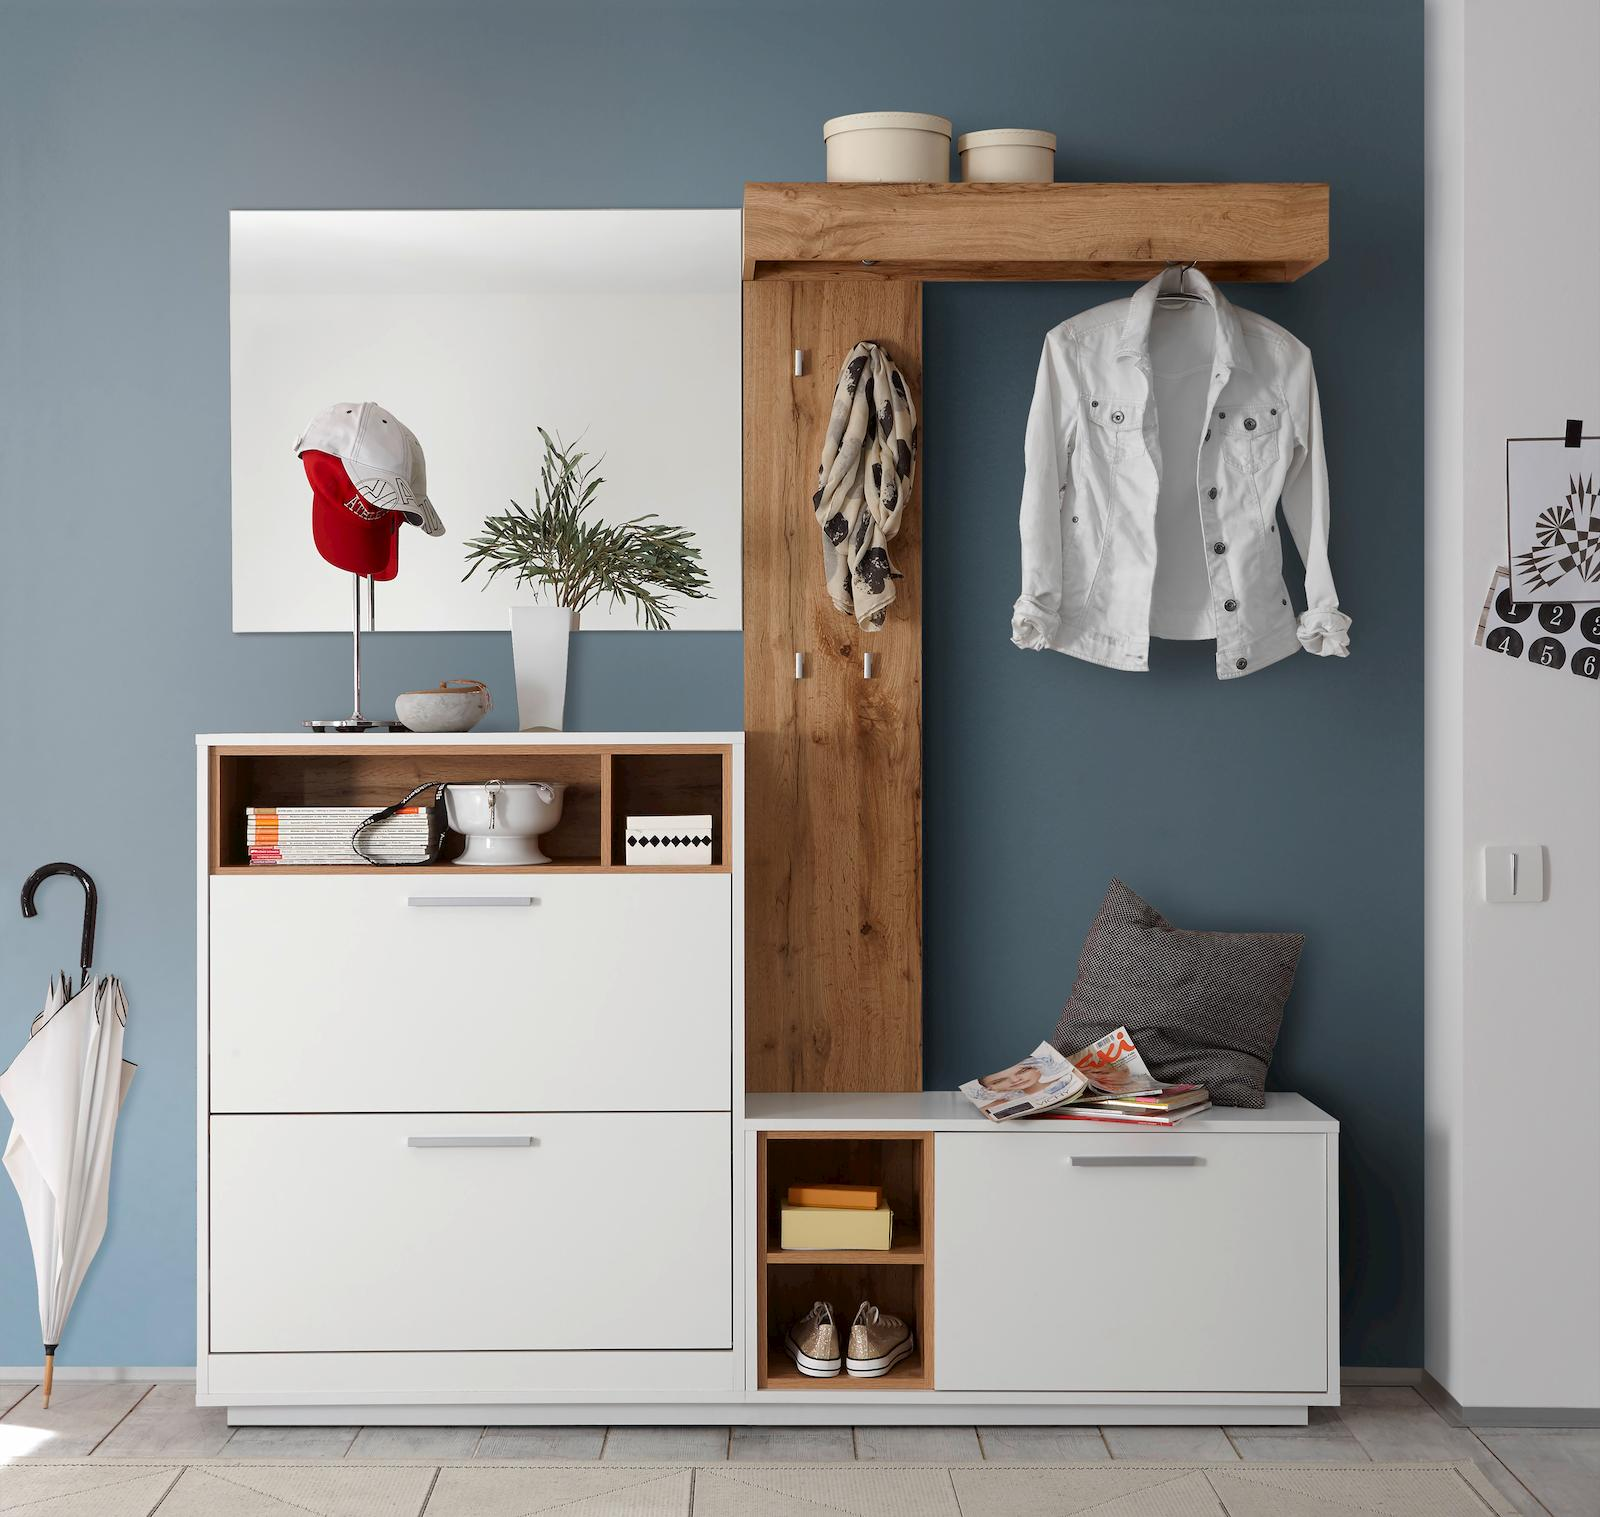 4 tlg milano garderobenkombination garderobe garderobeset. Black Bedroom Furniture Sets. Home Design Ideas